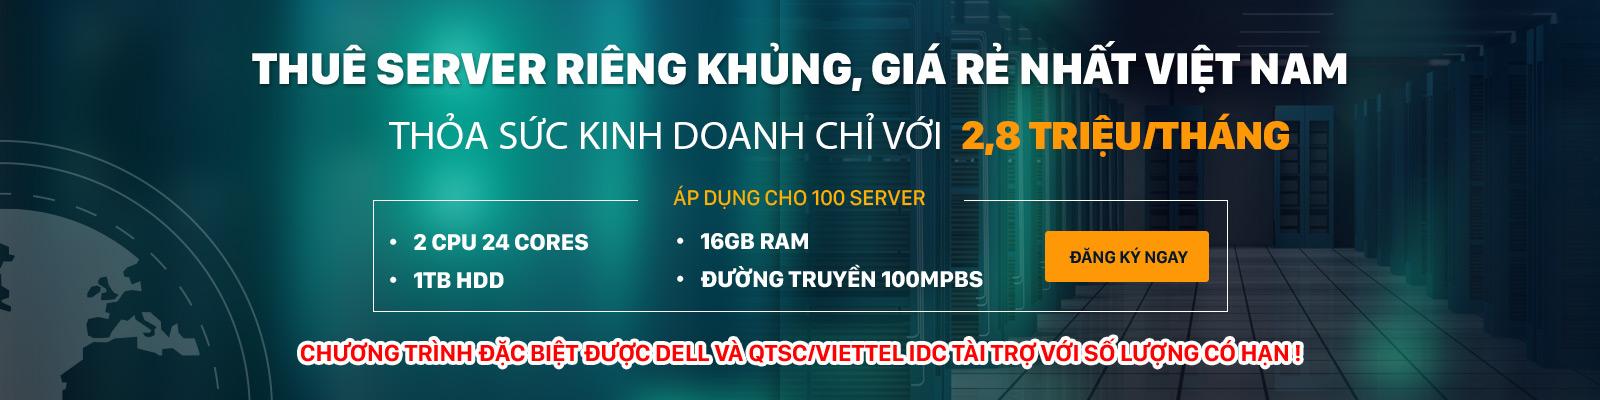 banner-server-khung